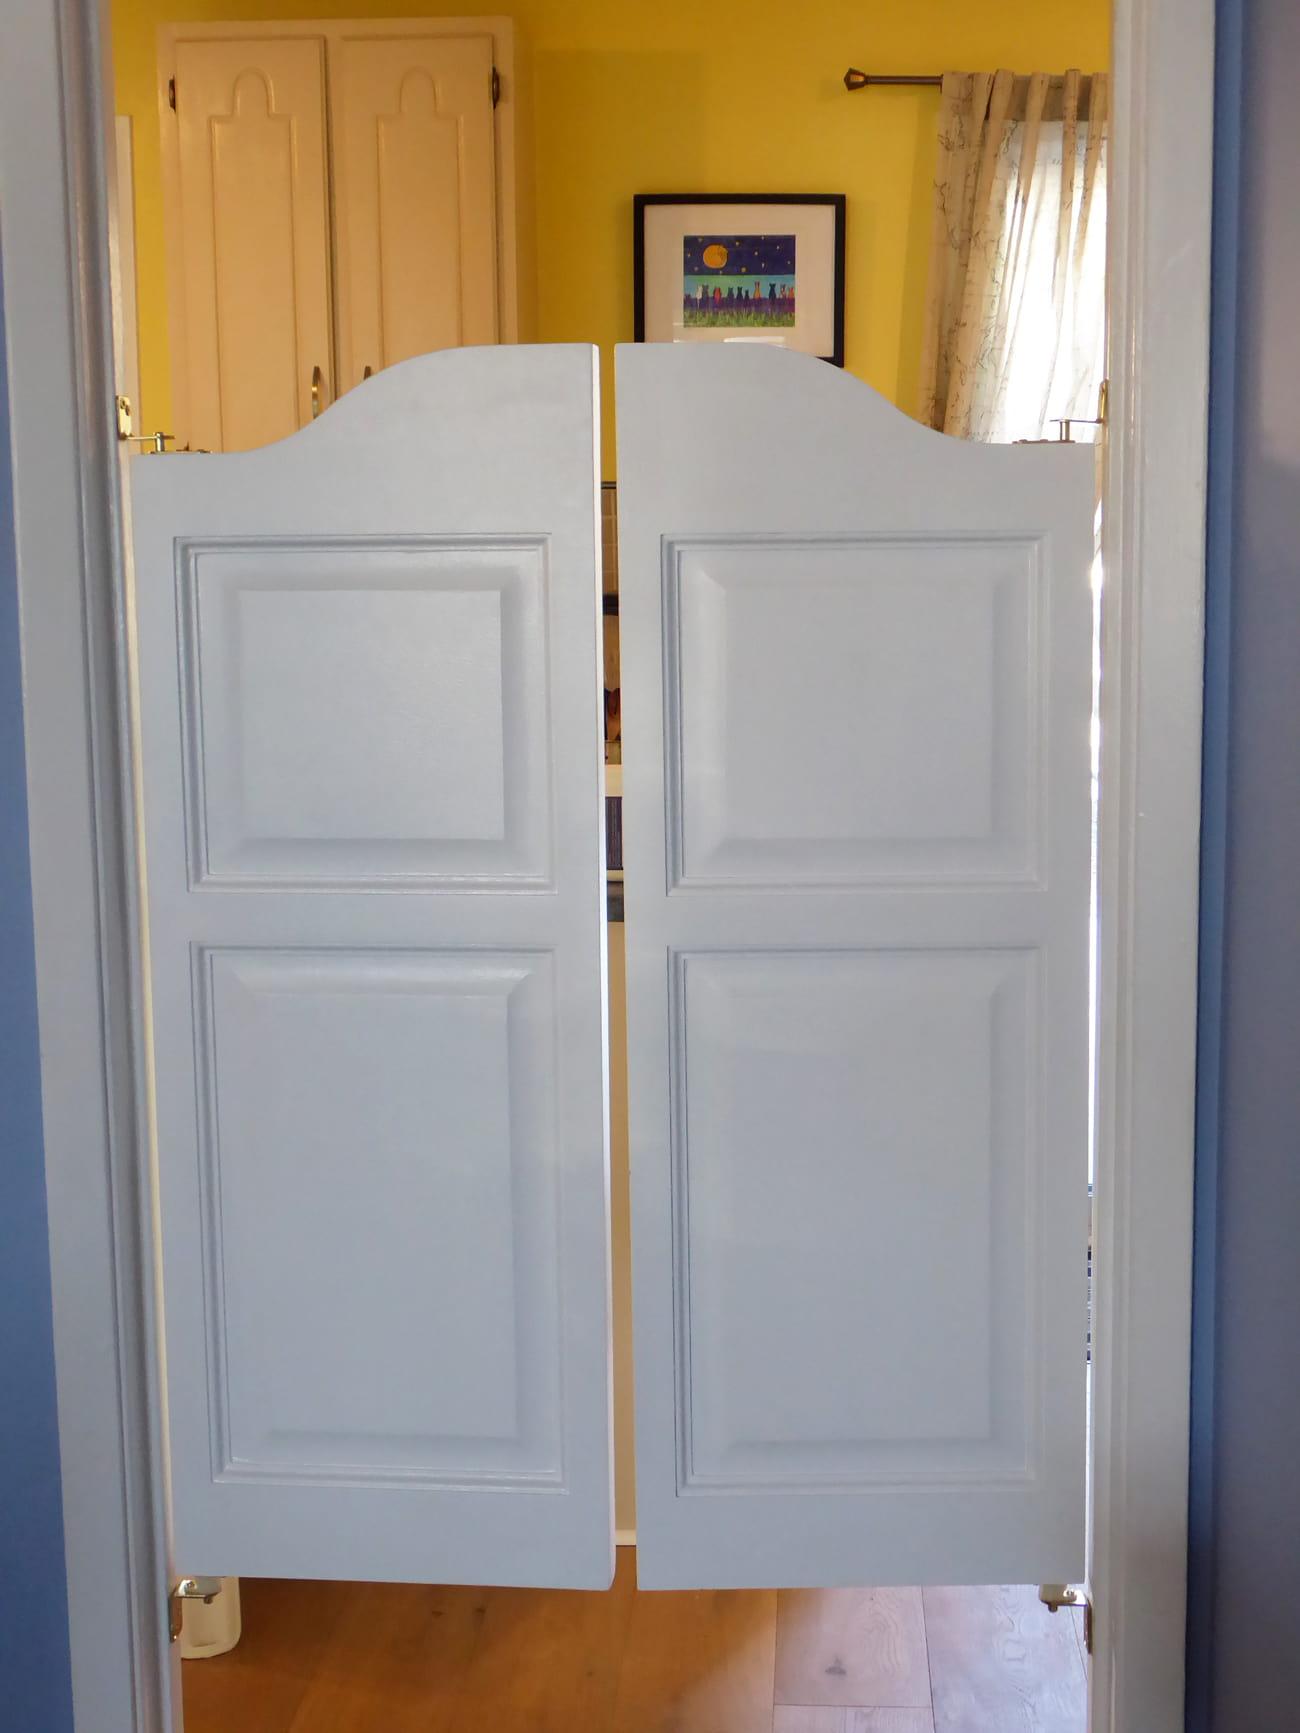 Double Swinging Arch Top Raised Panel Saloon Doors